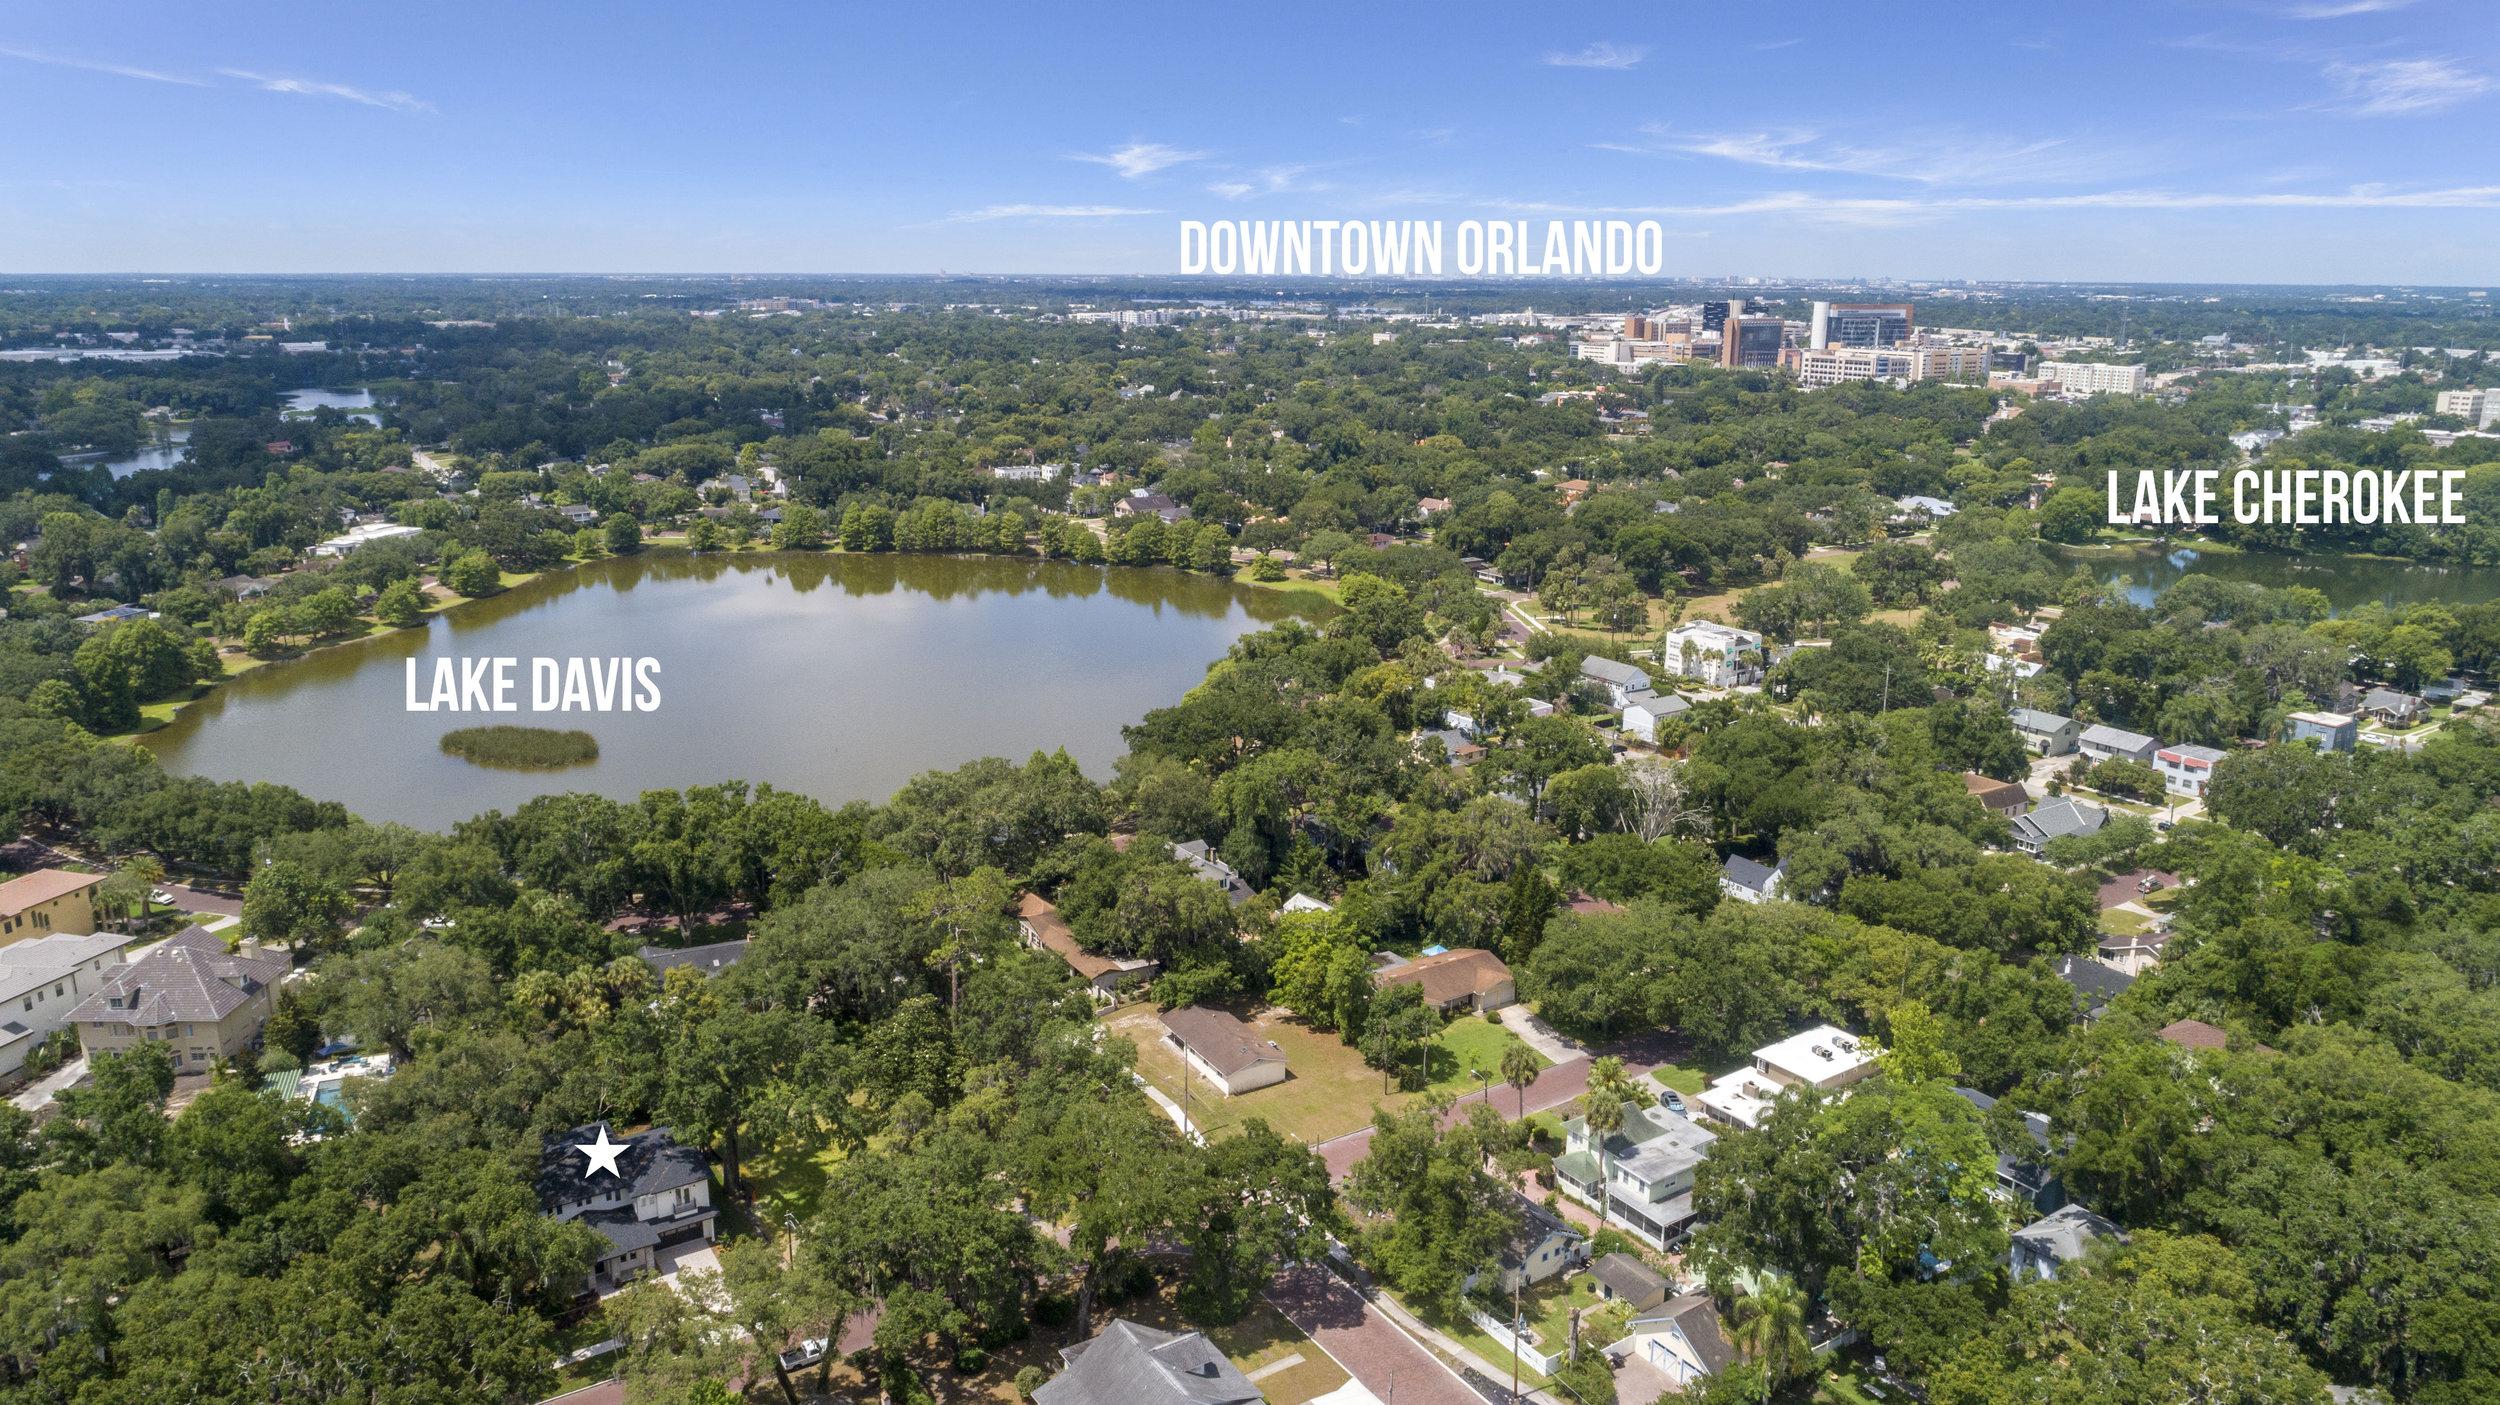 1008 Greenwood St, Orlando_DJI_0978.jpg